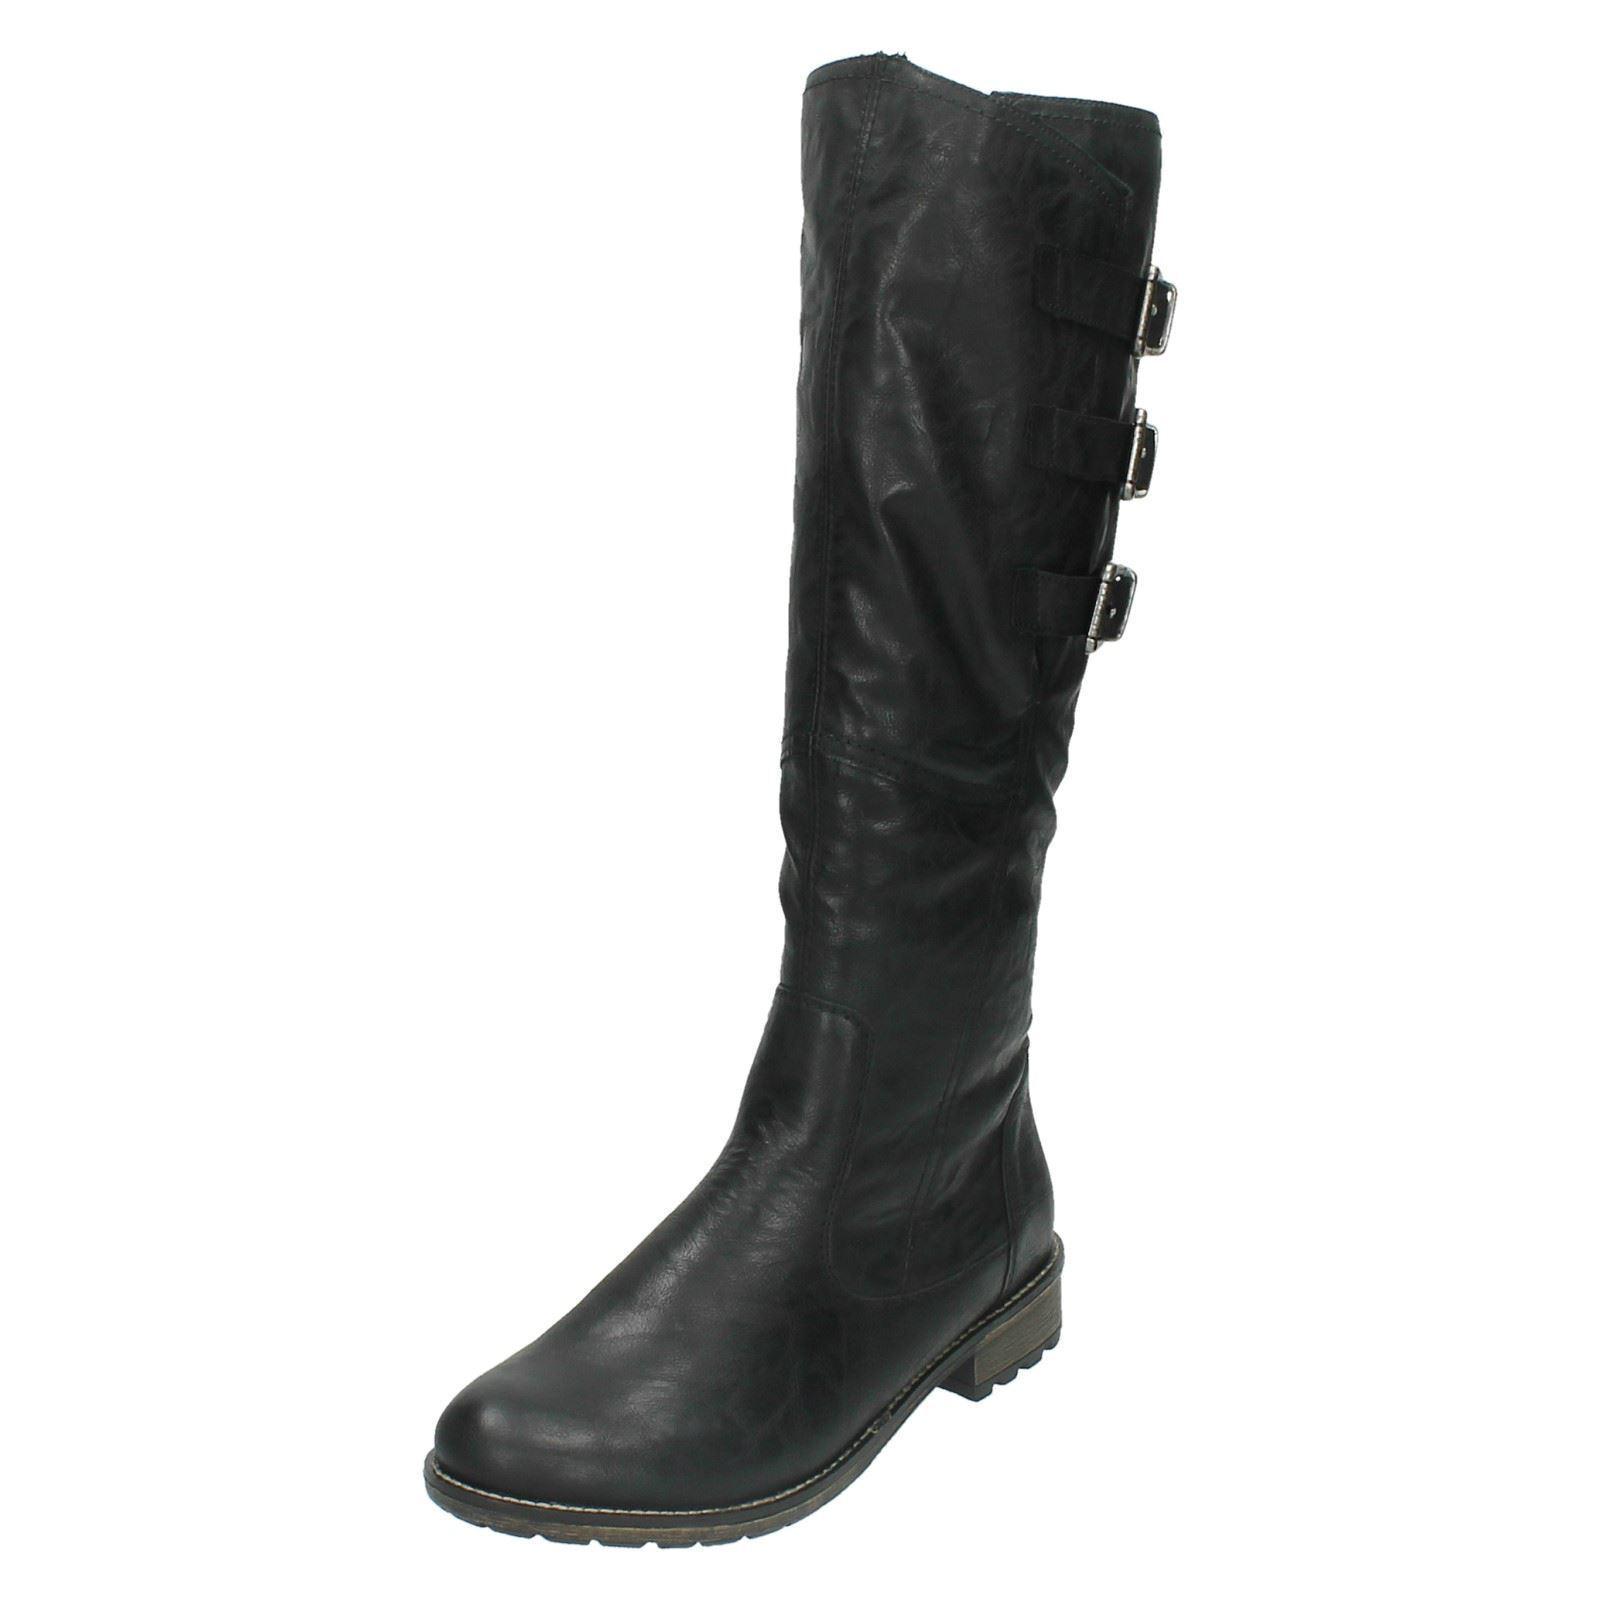 Señoras remonte r3370 Negro sintéticas cálido Forrado largo botas vaviable Pierna